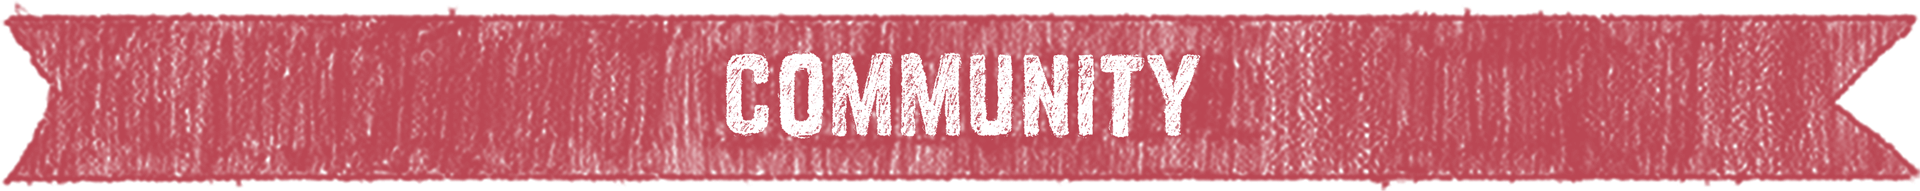 Heading Community